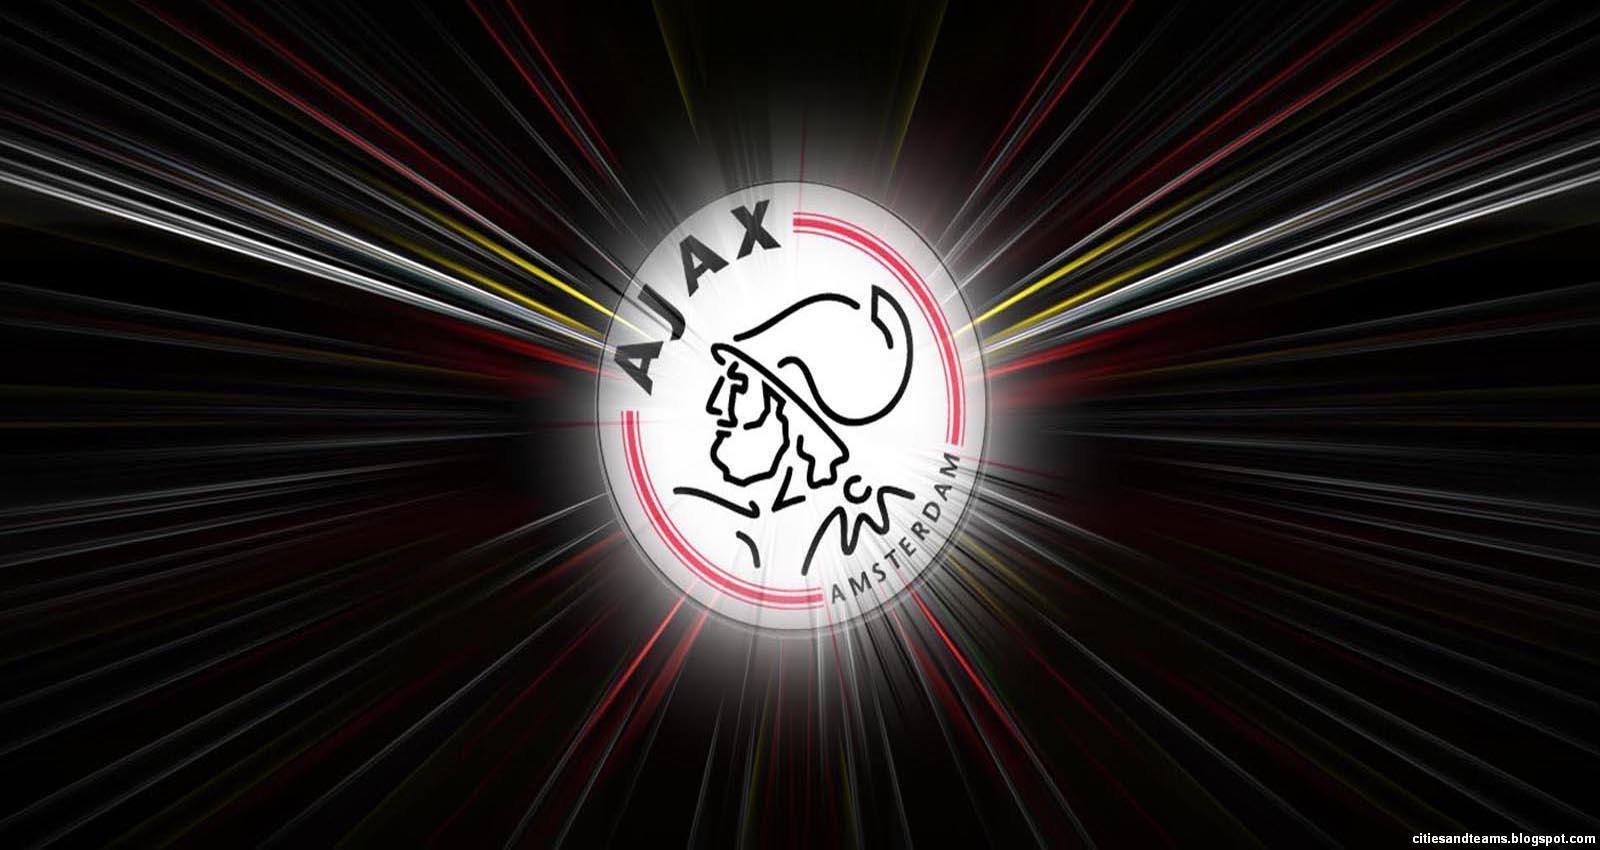 http://4.bp.blogspot.com/-eWArn7NTcDU/UNOgqk7ZdbI/AAAAAAAAI-I/TTj3cMmqiKk/s1600/Ajax_Amsterdam_Dutch_The_Lancers_Logo_Eredivisie_Netherlands_Hd_Desktop_Wallpaper_citiesandteams.blogspot.com.jpg